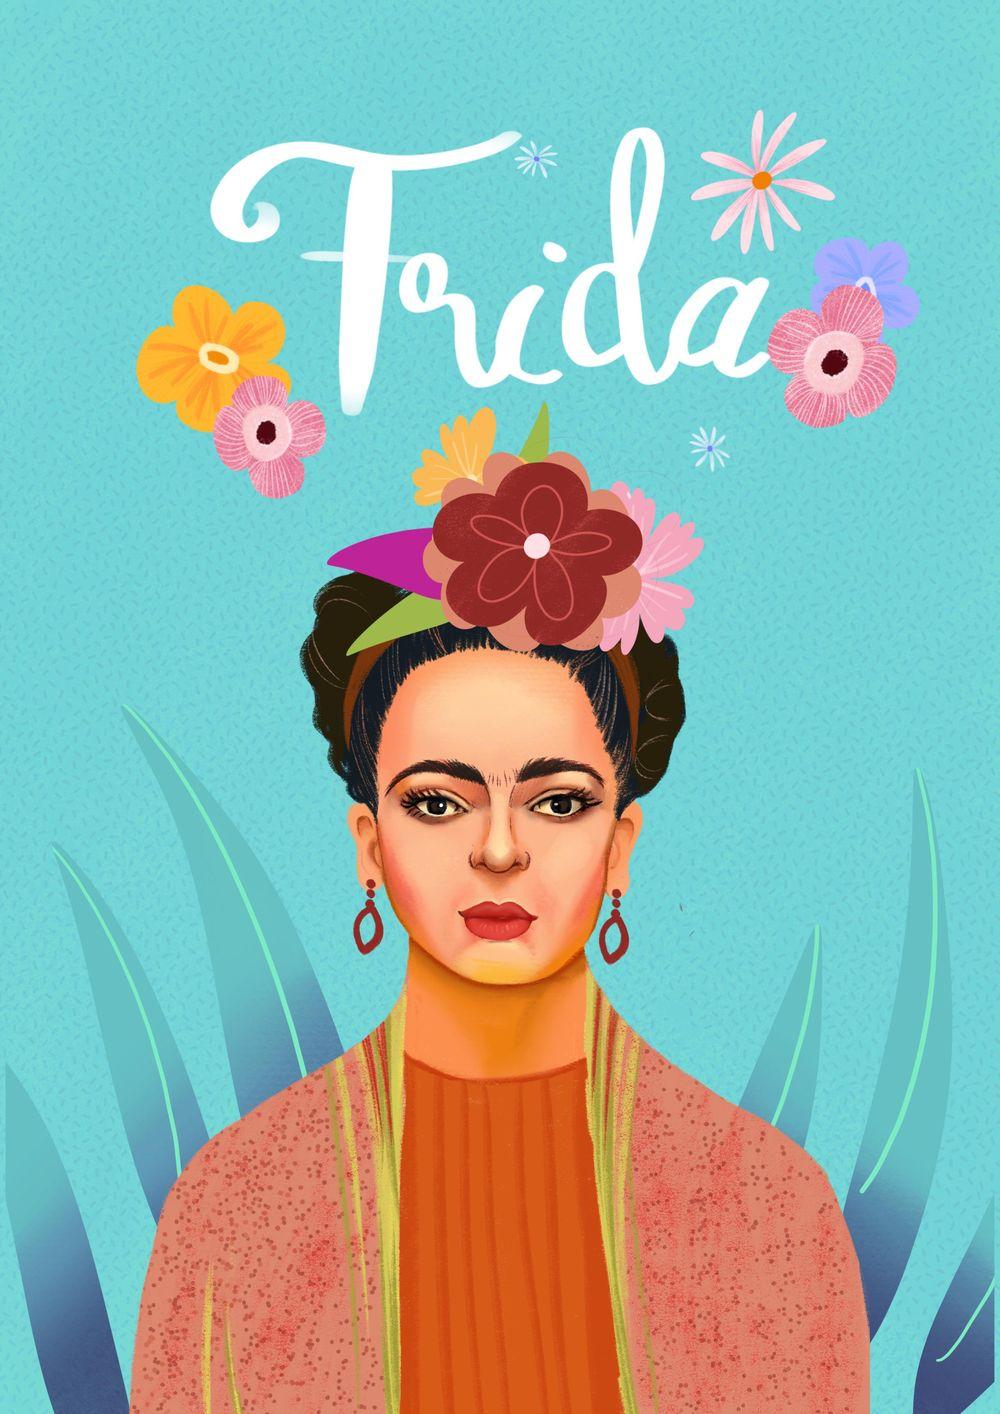 Frida Kahlo Portrait - image 1 - student project